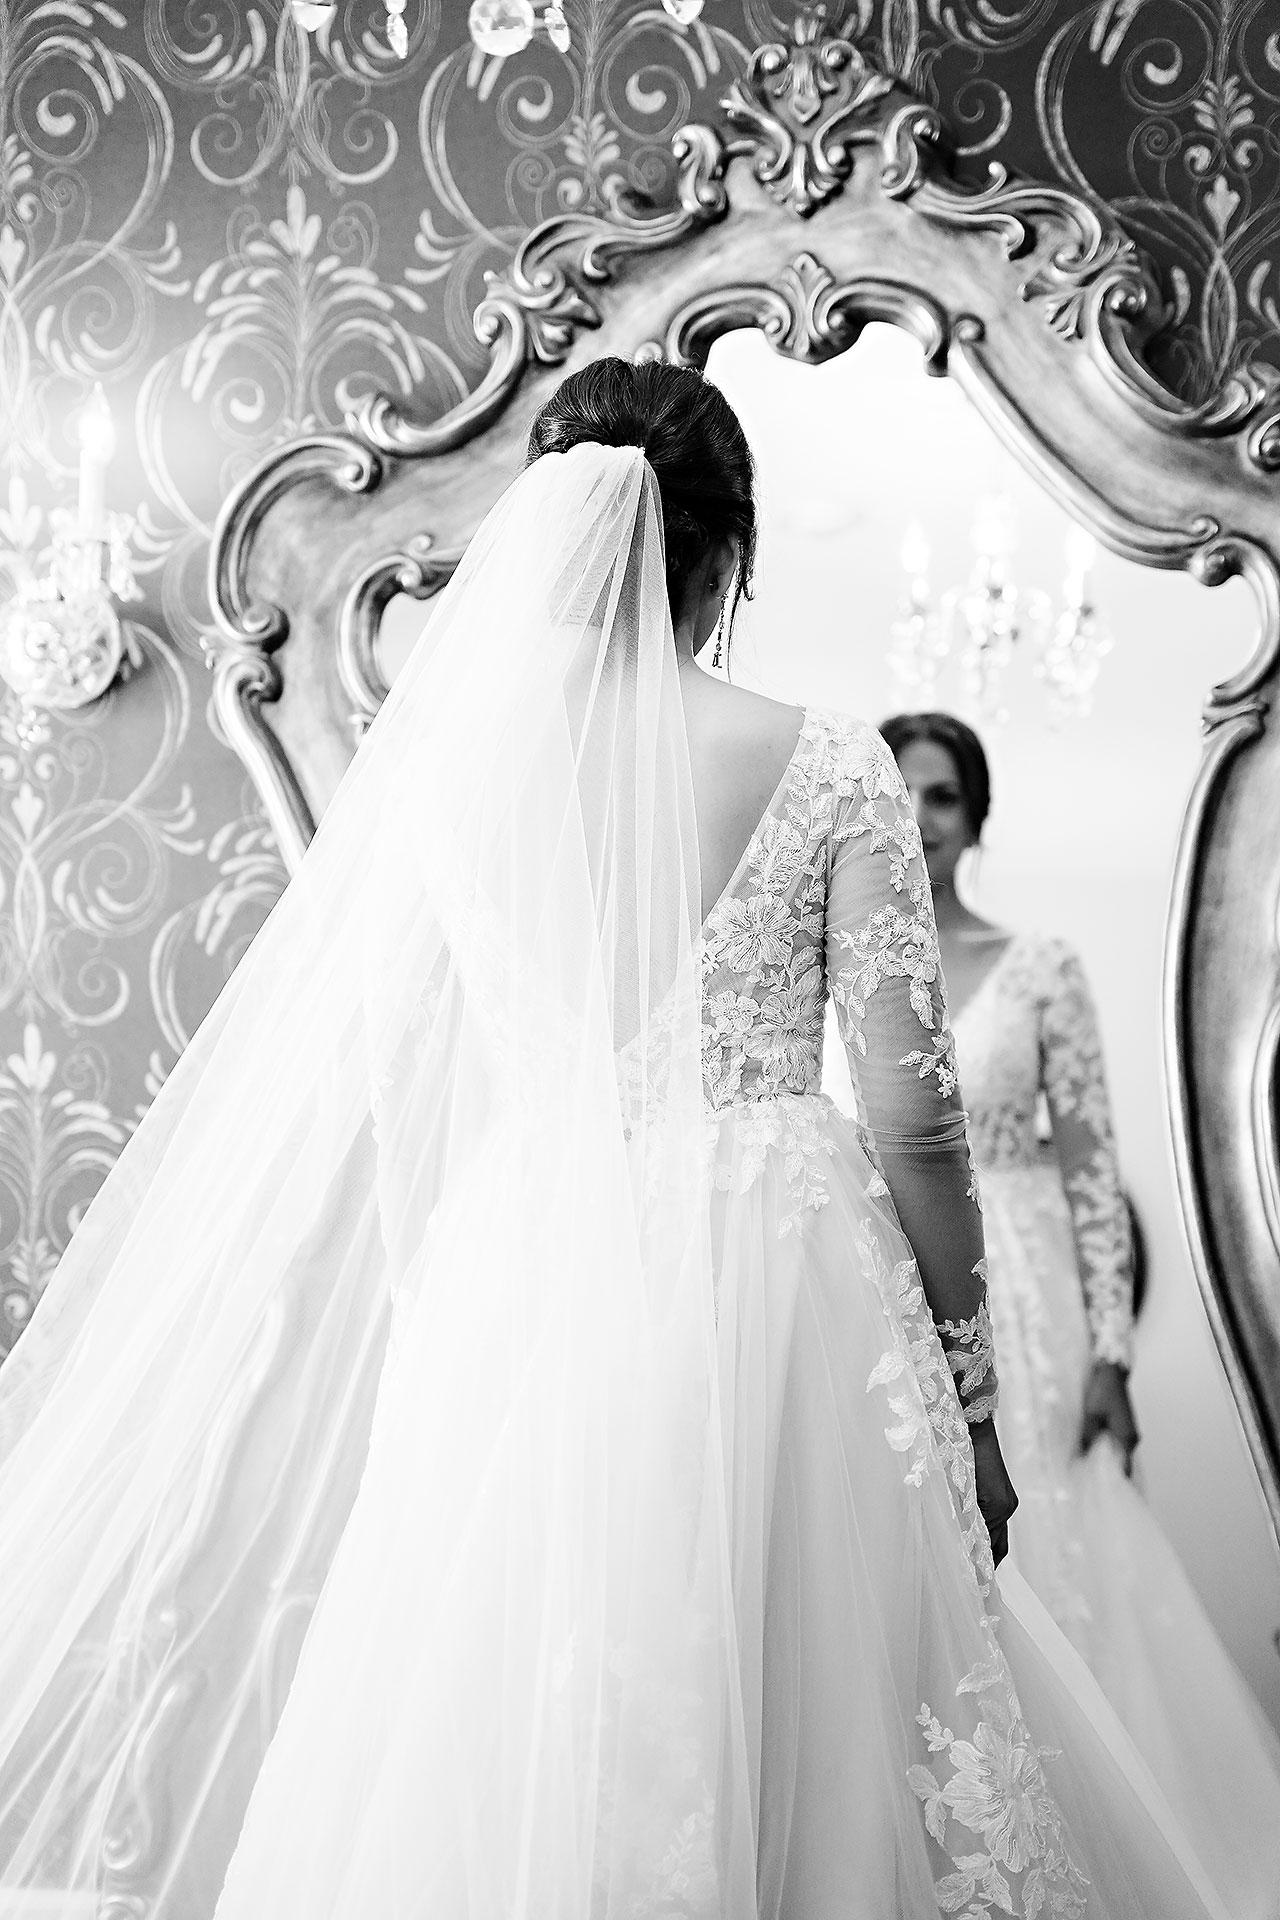 Nadia Parker Black Iris Estate Carmel Indiana Wedding May 2021 030